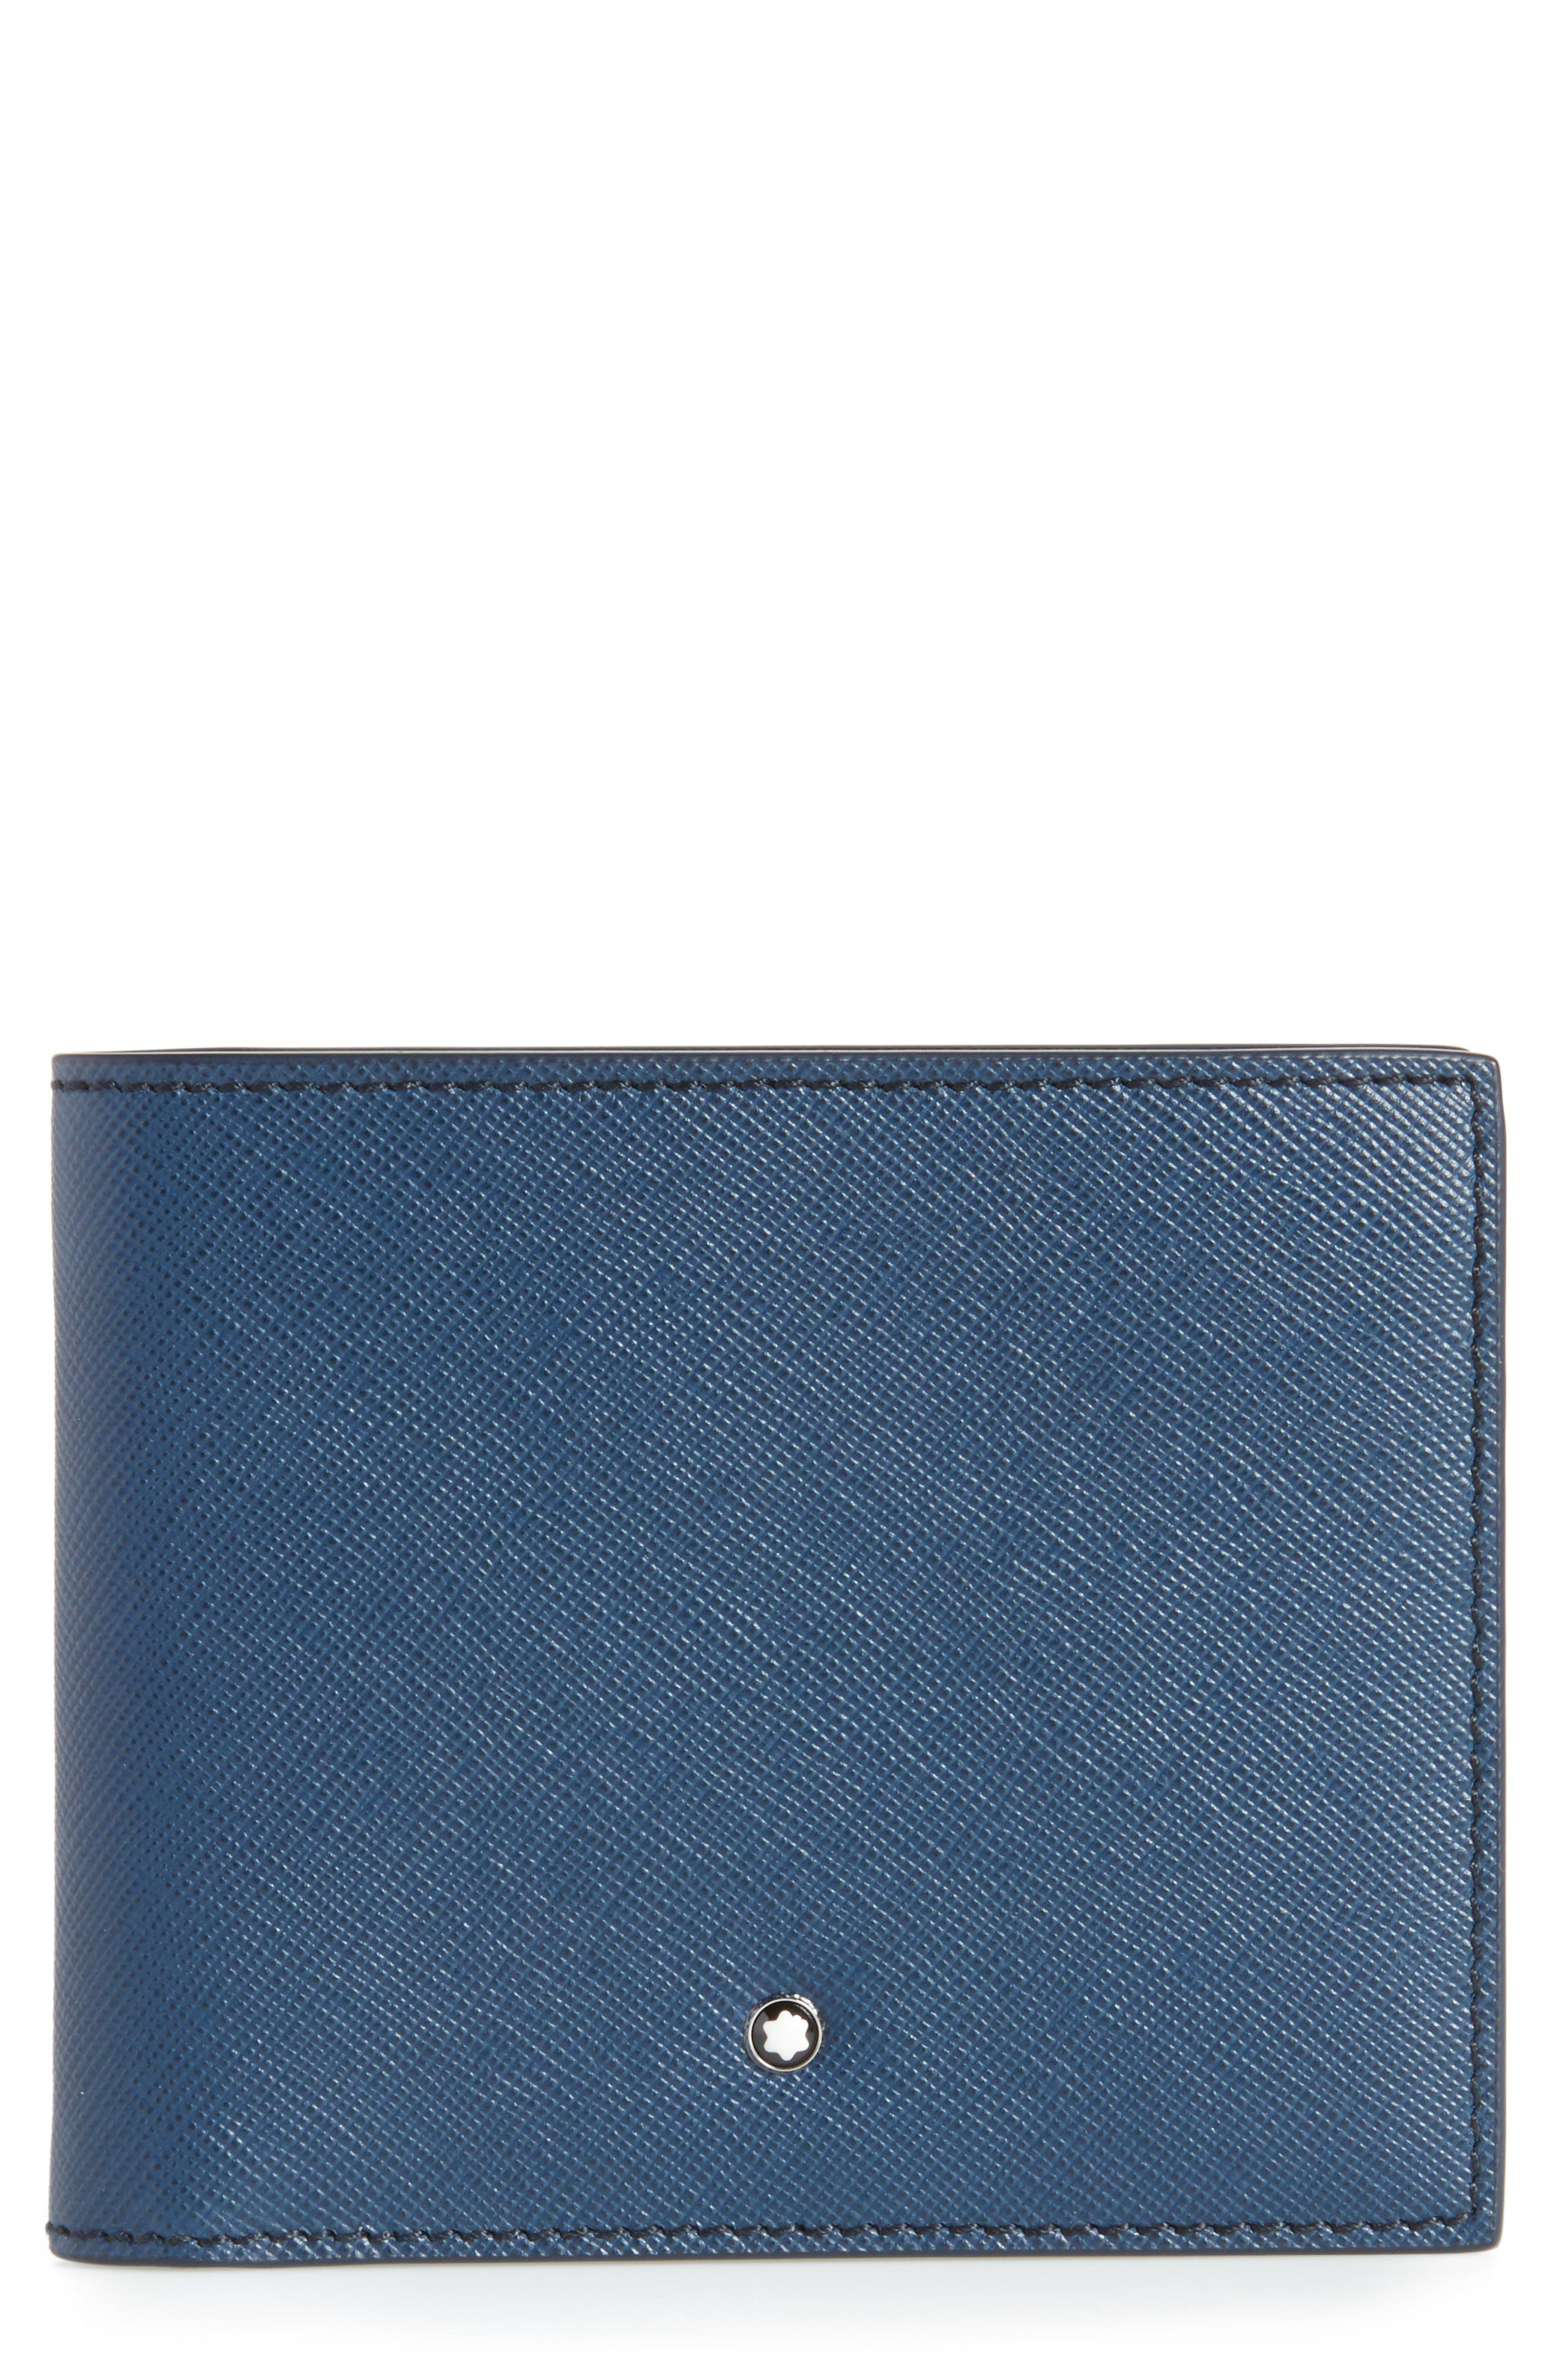 MONTBLANC Sartorial Leather Wallet, Main, color, INDIGO